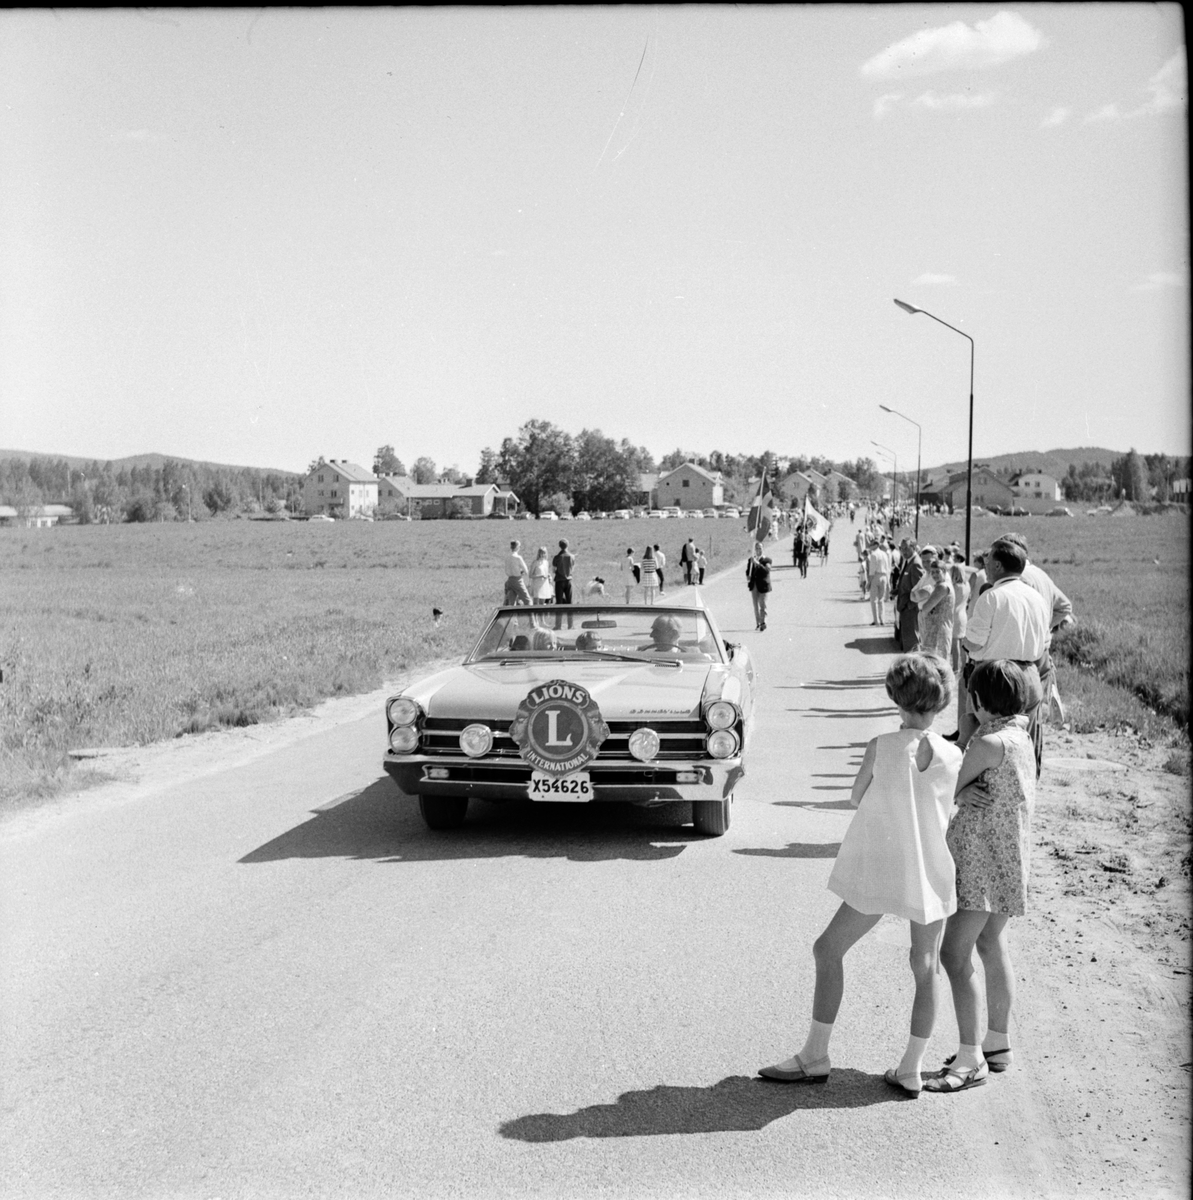 Arbrå, B.D. Karneval, Juni 1967